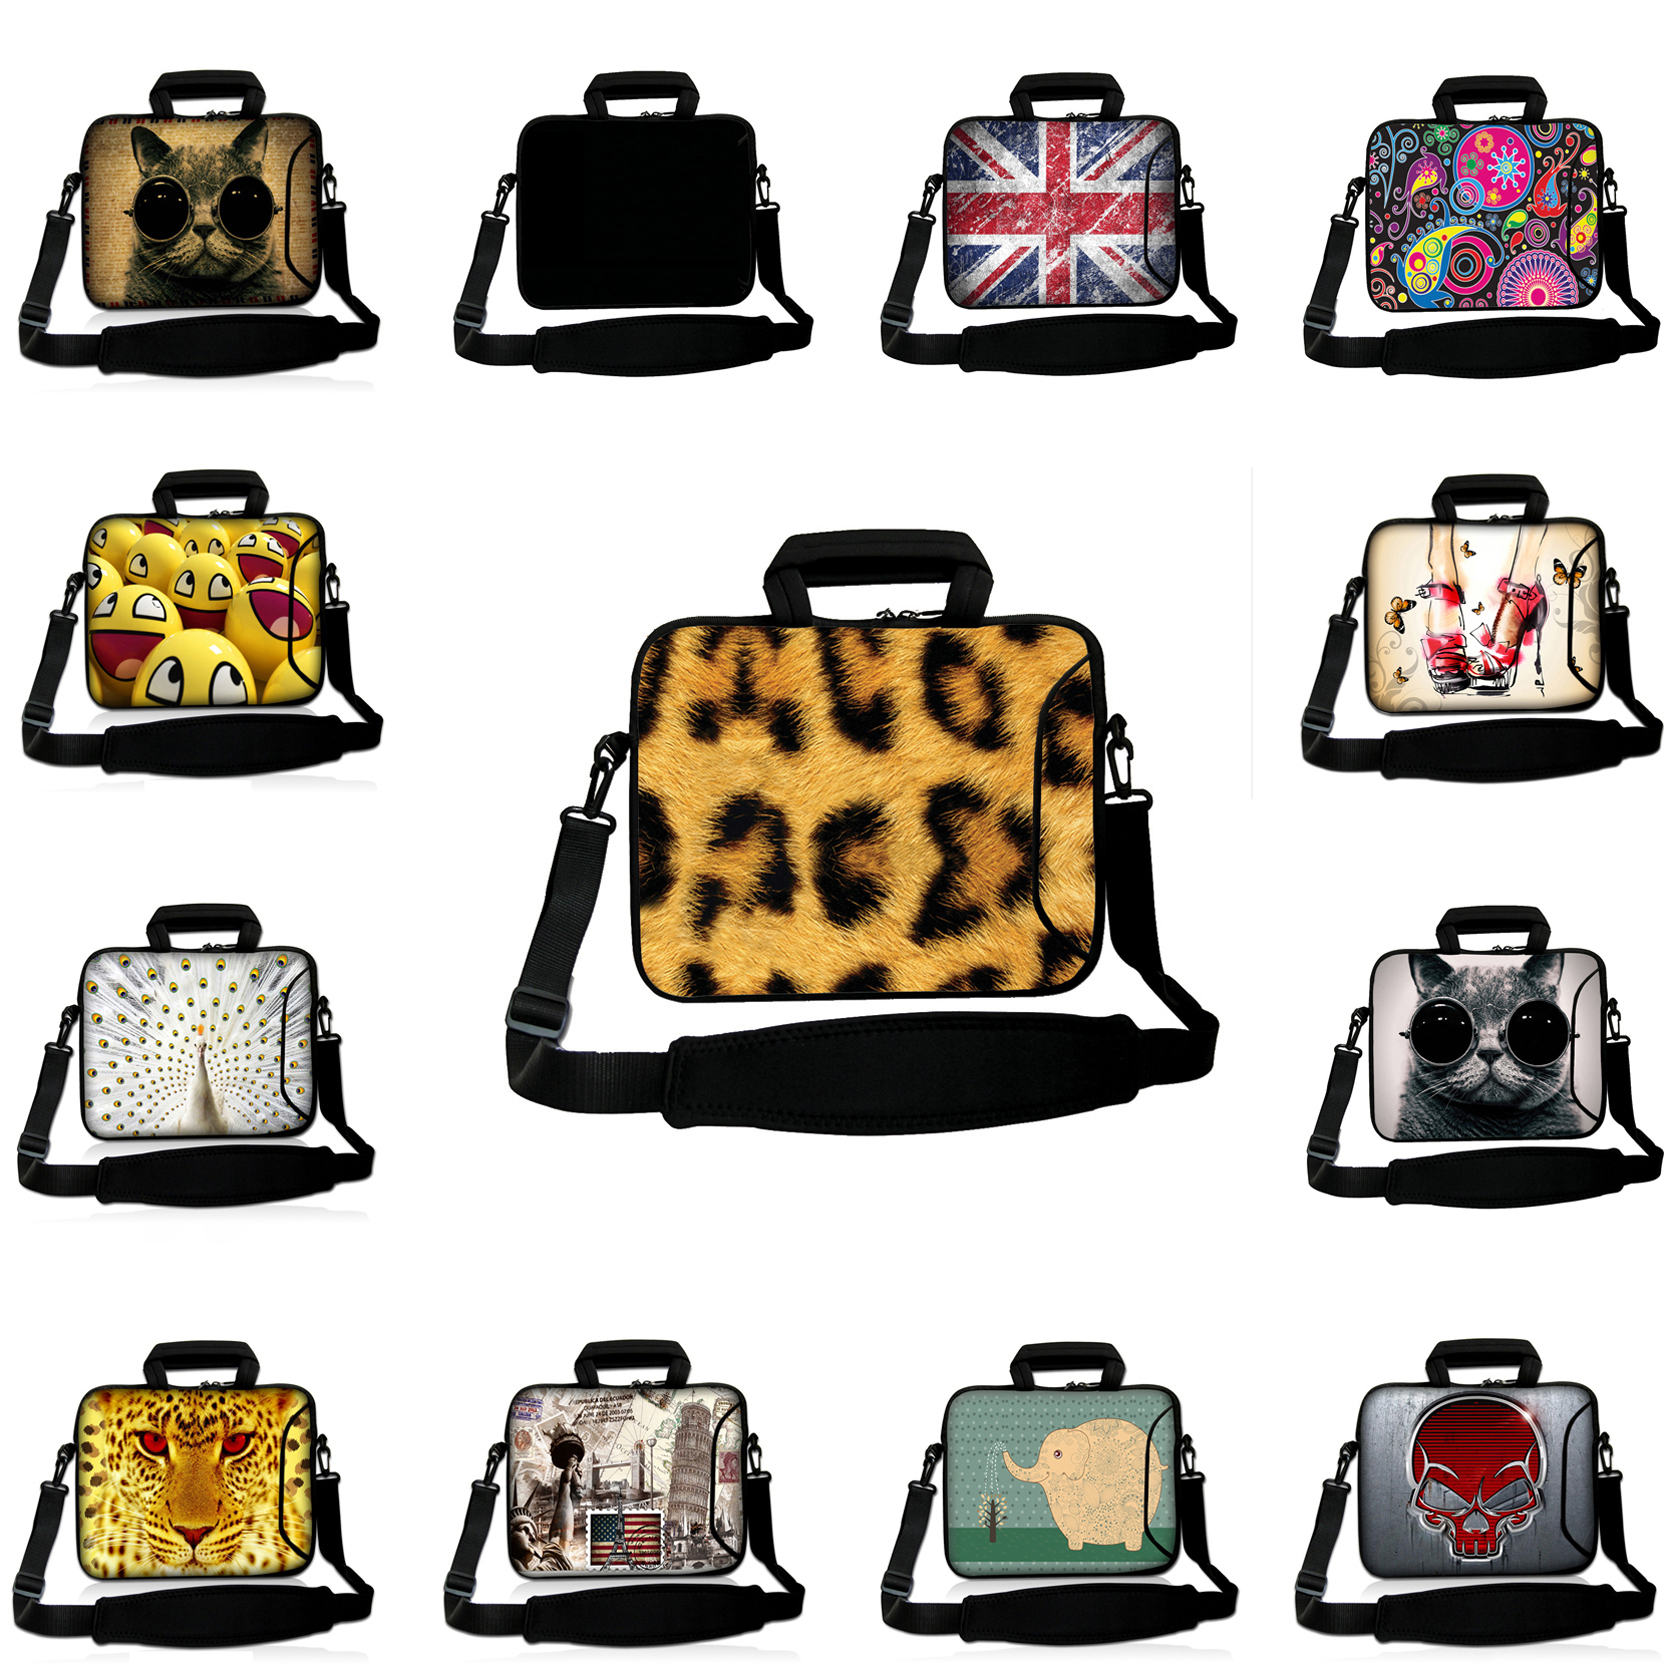 Print Universal 13 12 10 14 15 17 Inch Funda Portatil 15.6 Notebook Messenger Bags Laptop Shoulder Handle Bags Cover Cases Women